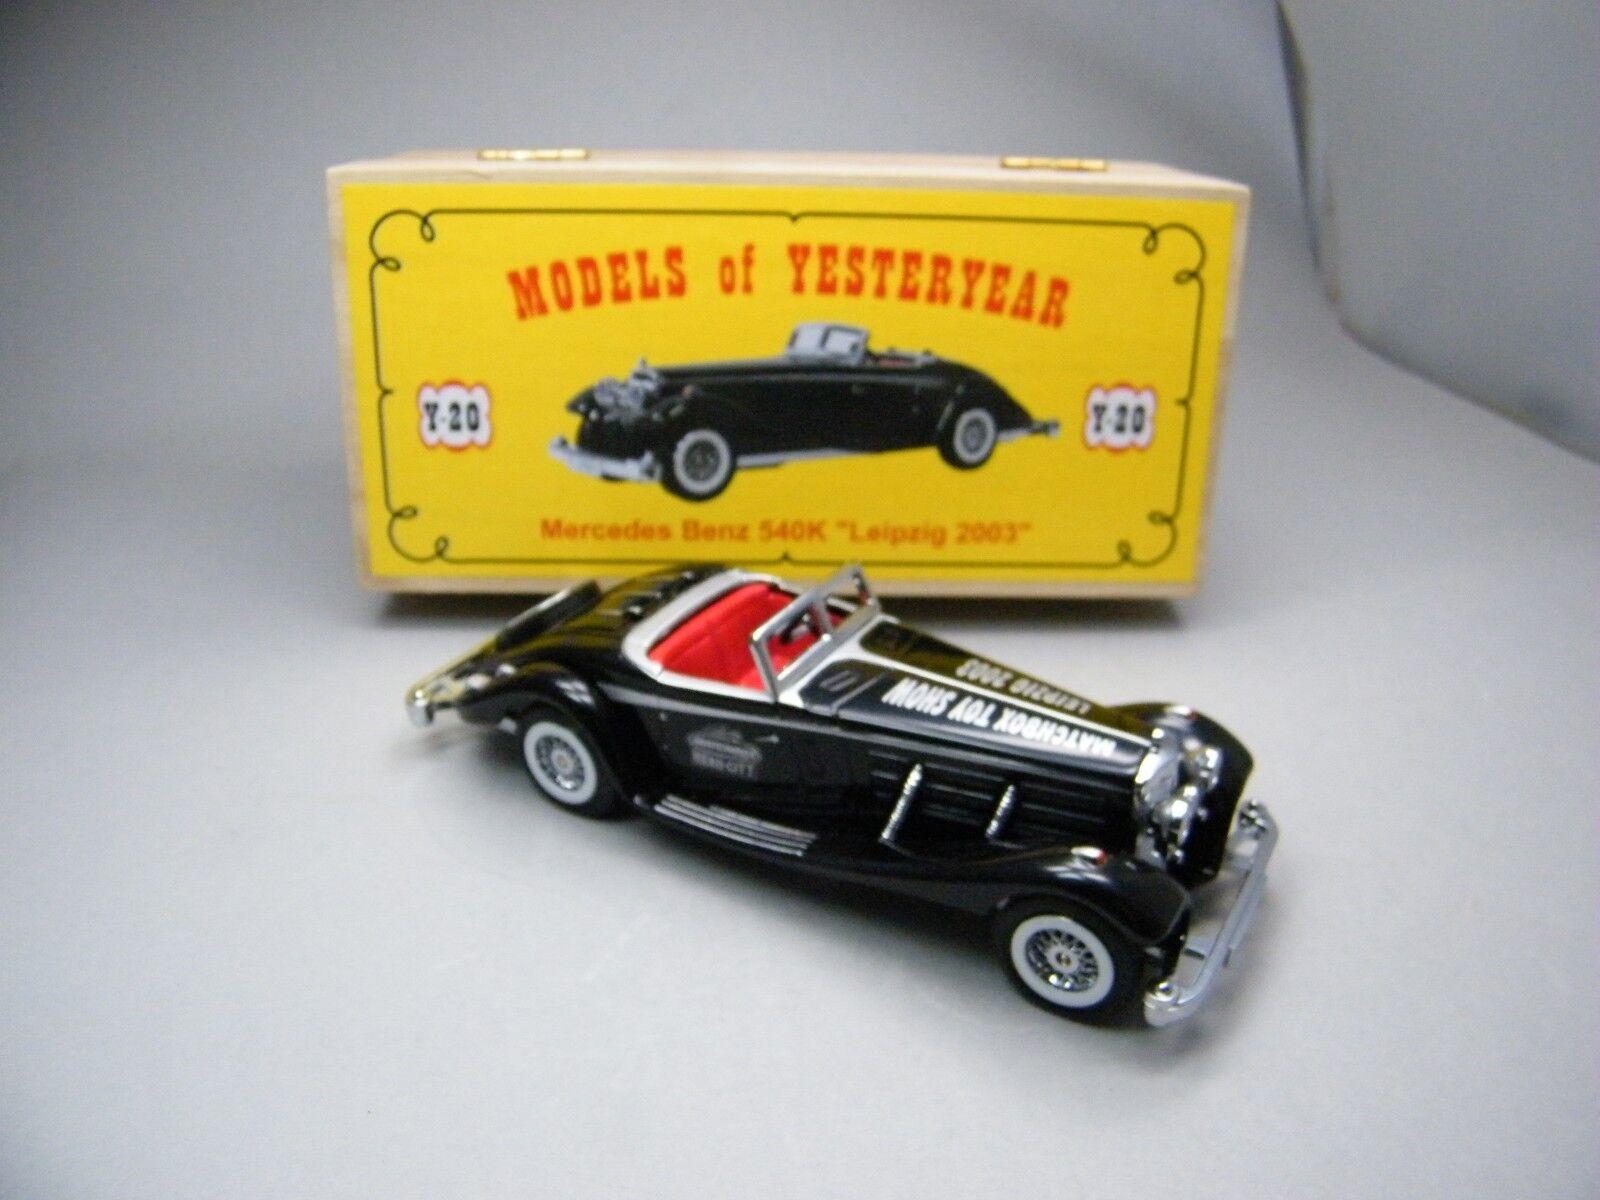 Matchbox MoY C2 C2 C2 Y20 Mercedes Benz 540K black Leipzig 2003 selten OVP K13 930f1c